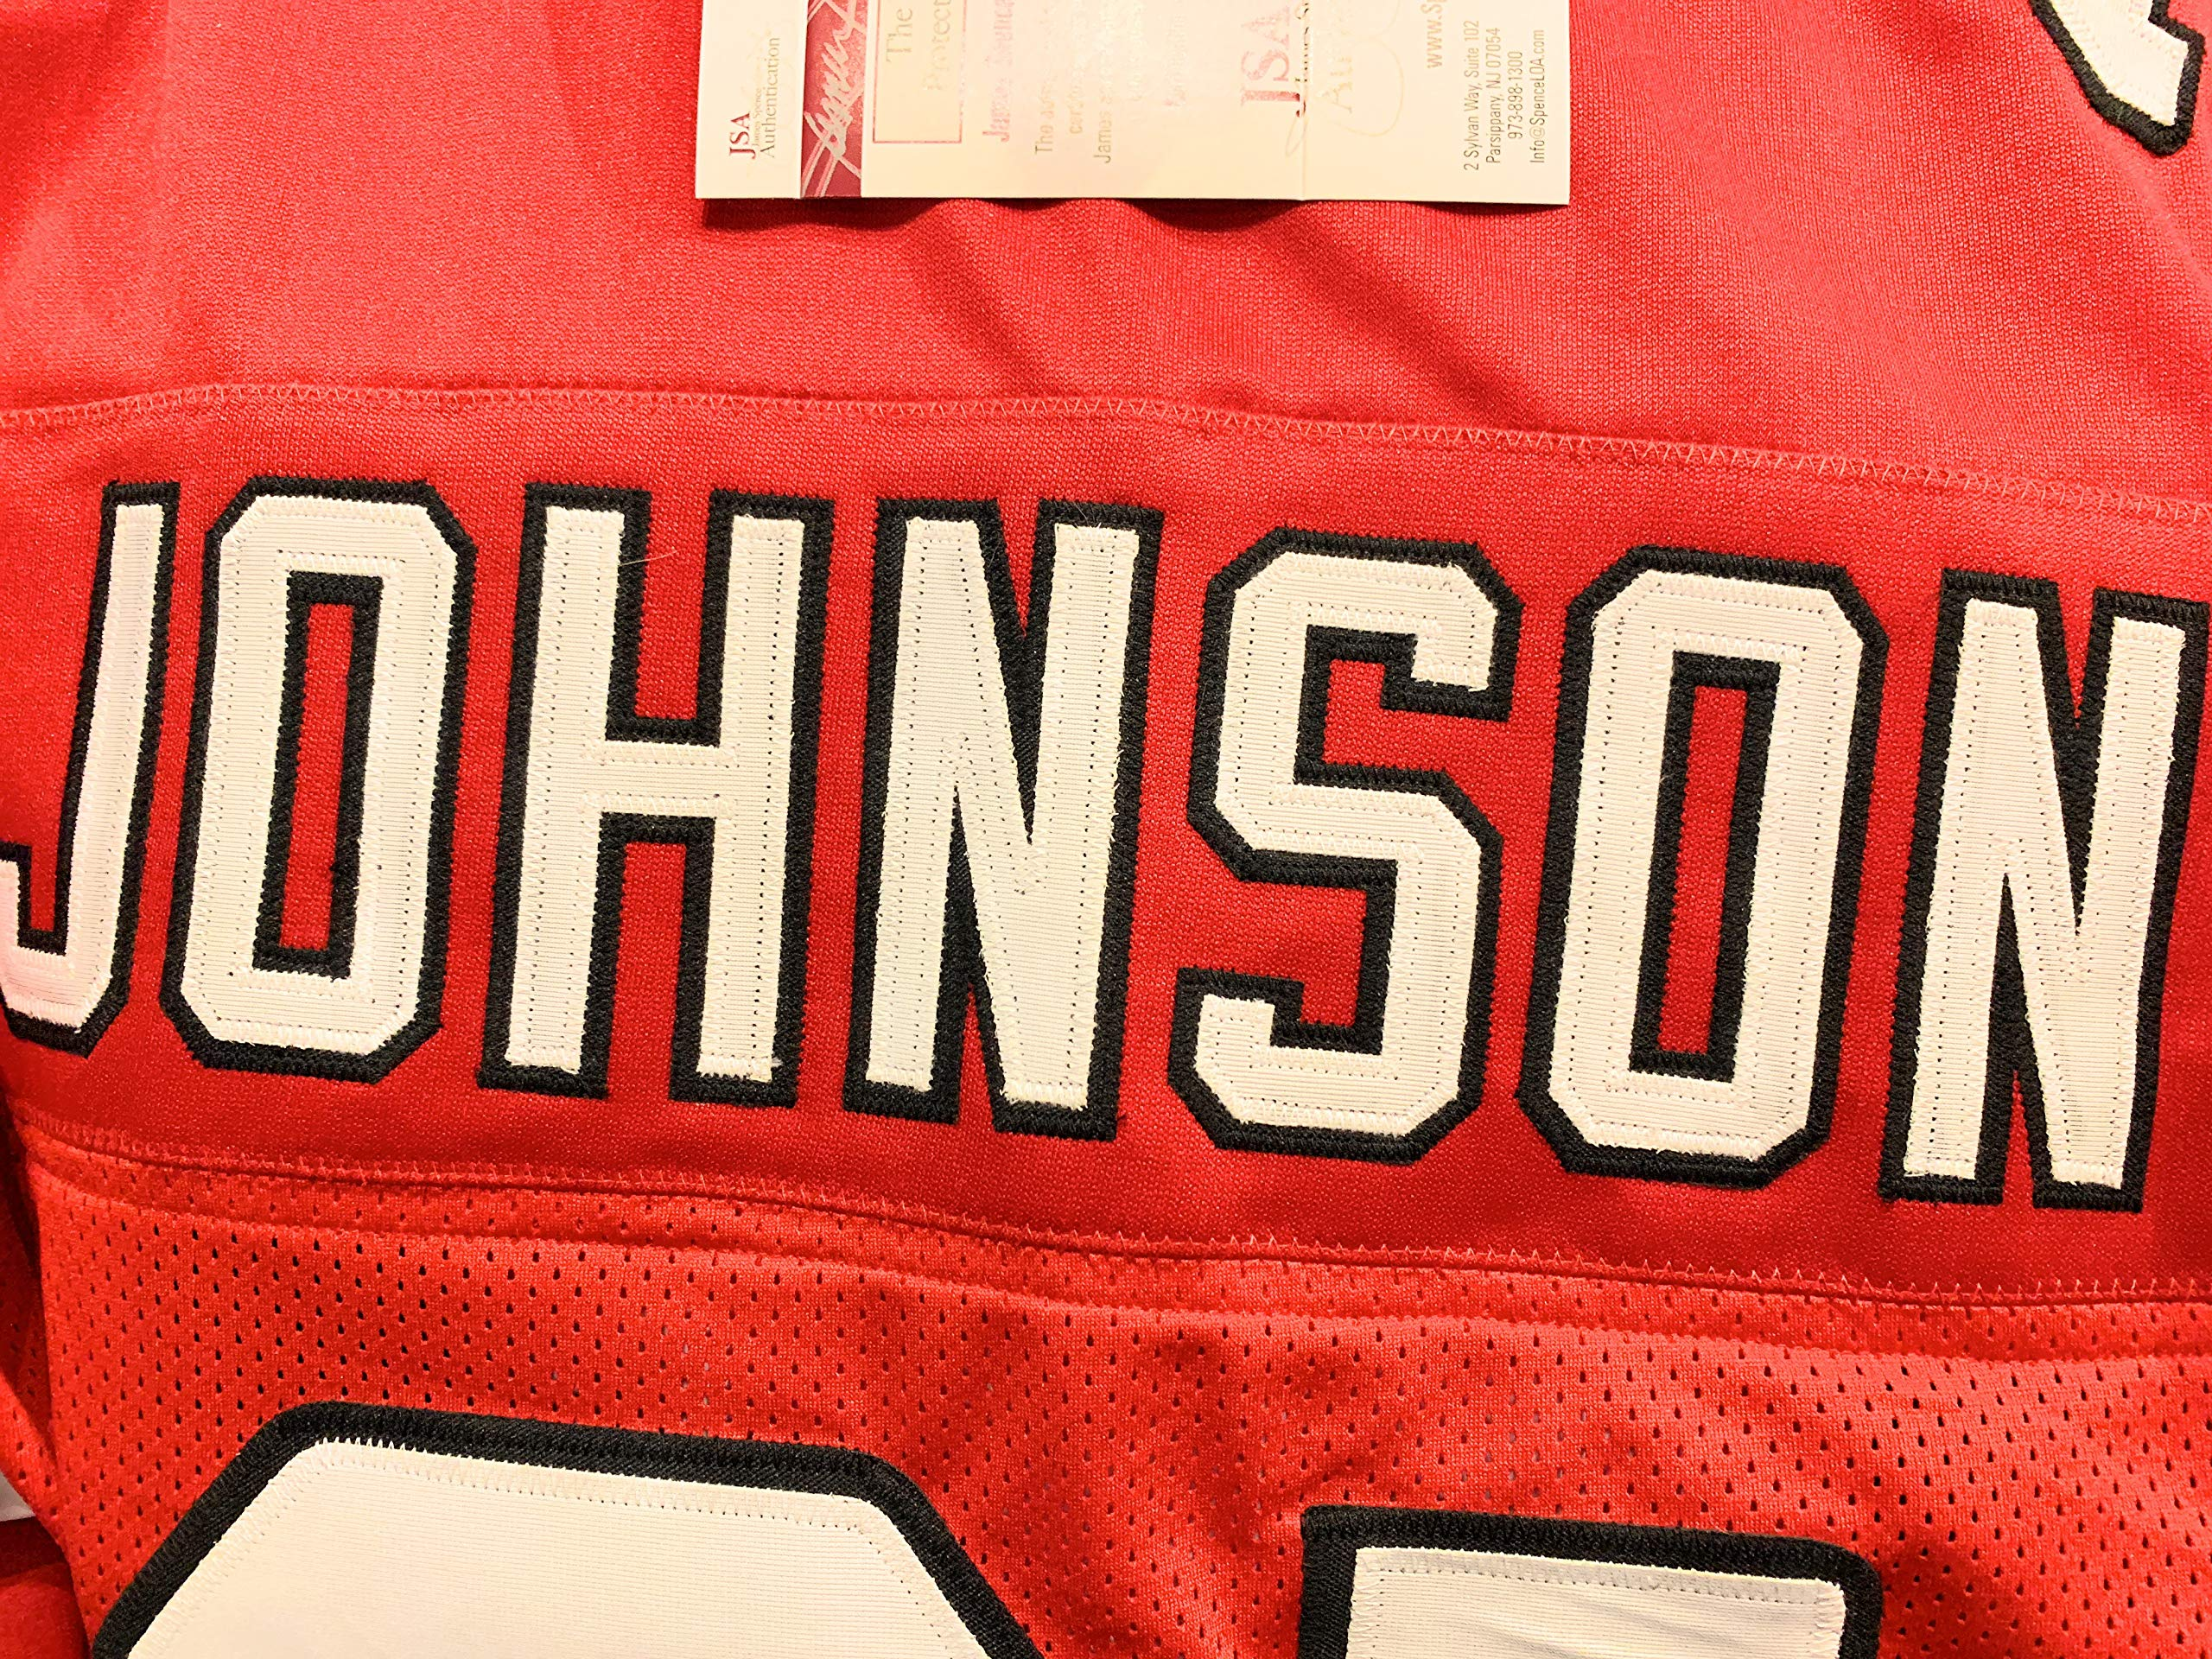 David Johnson Arizona Cardinals Signed Autograph Red Custom Jersey JSA Witnessed Certified